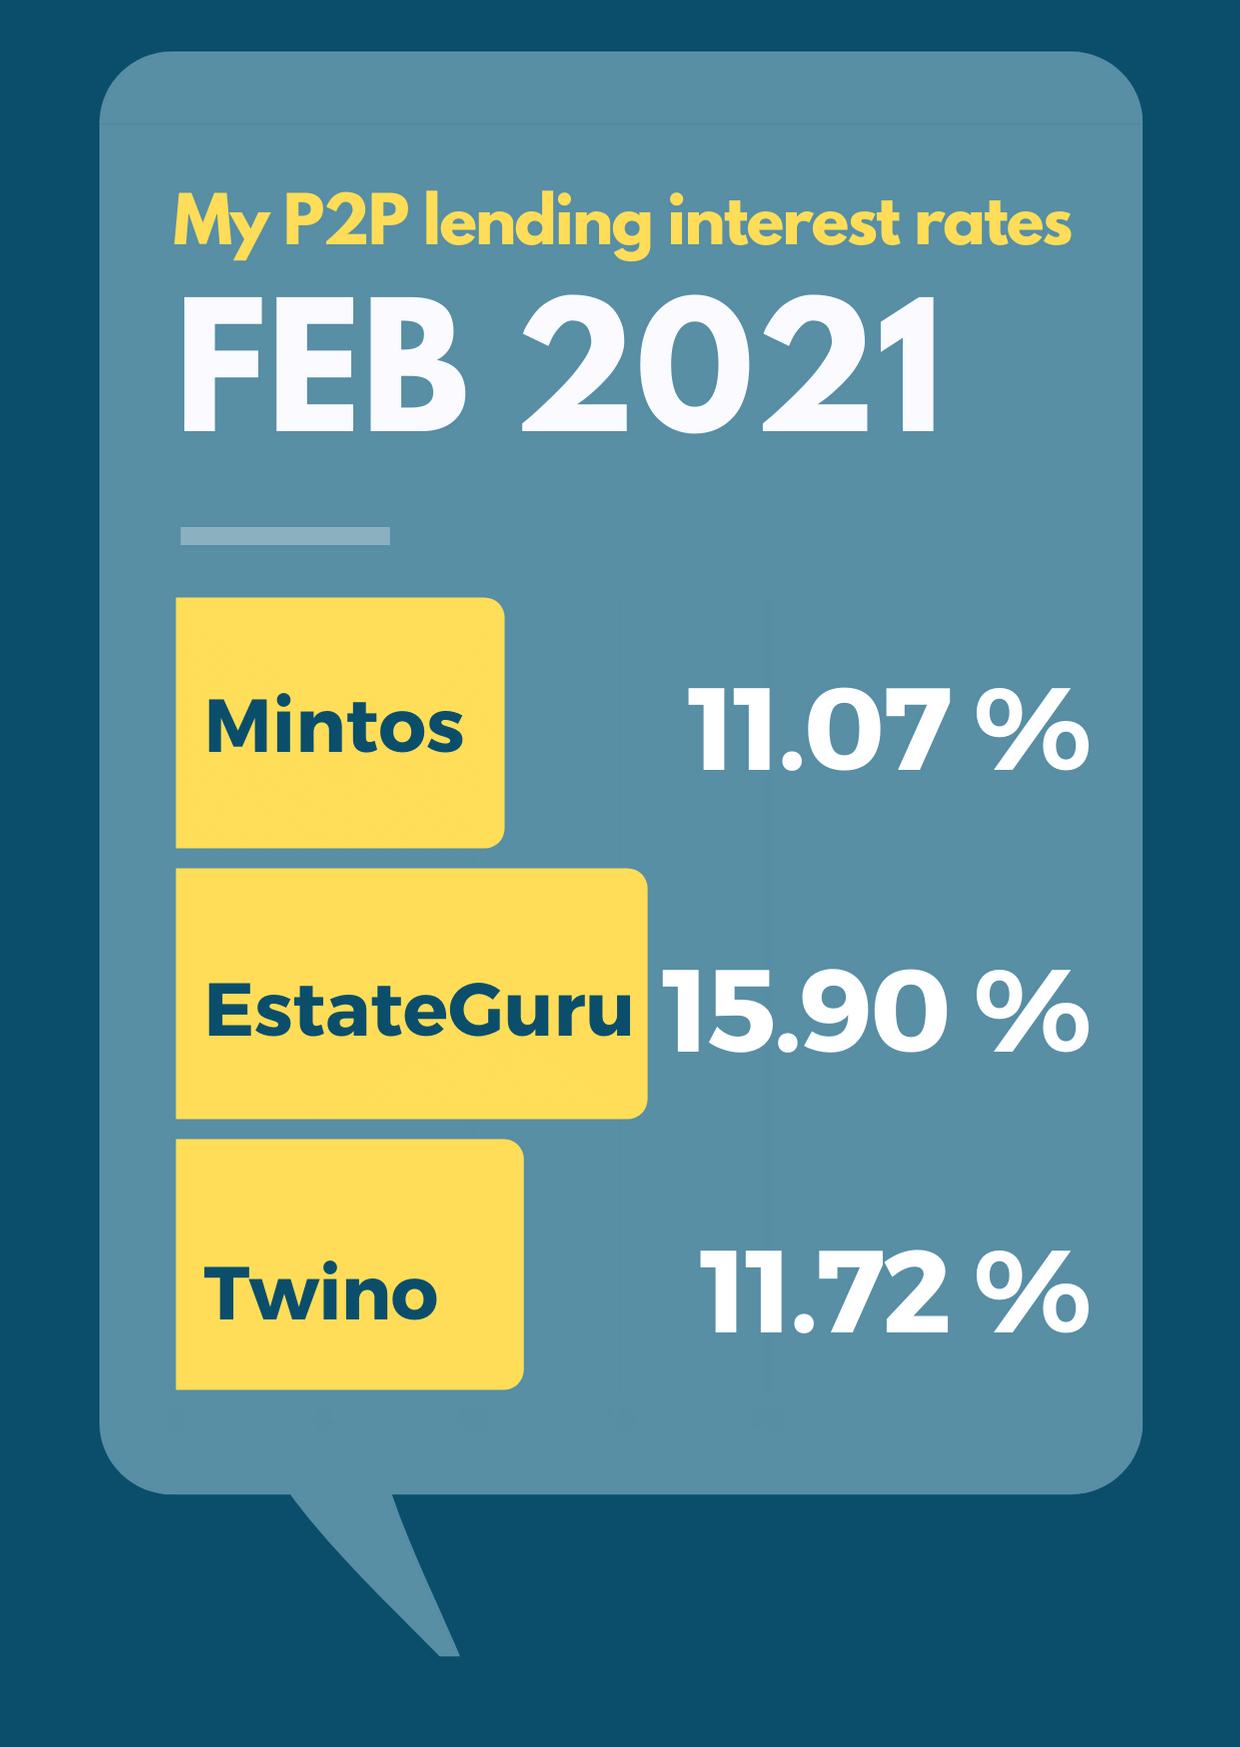 February 2021 P2P-Lending Interest Rates